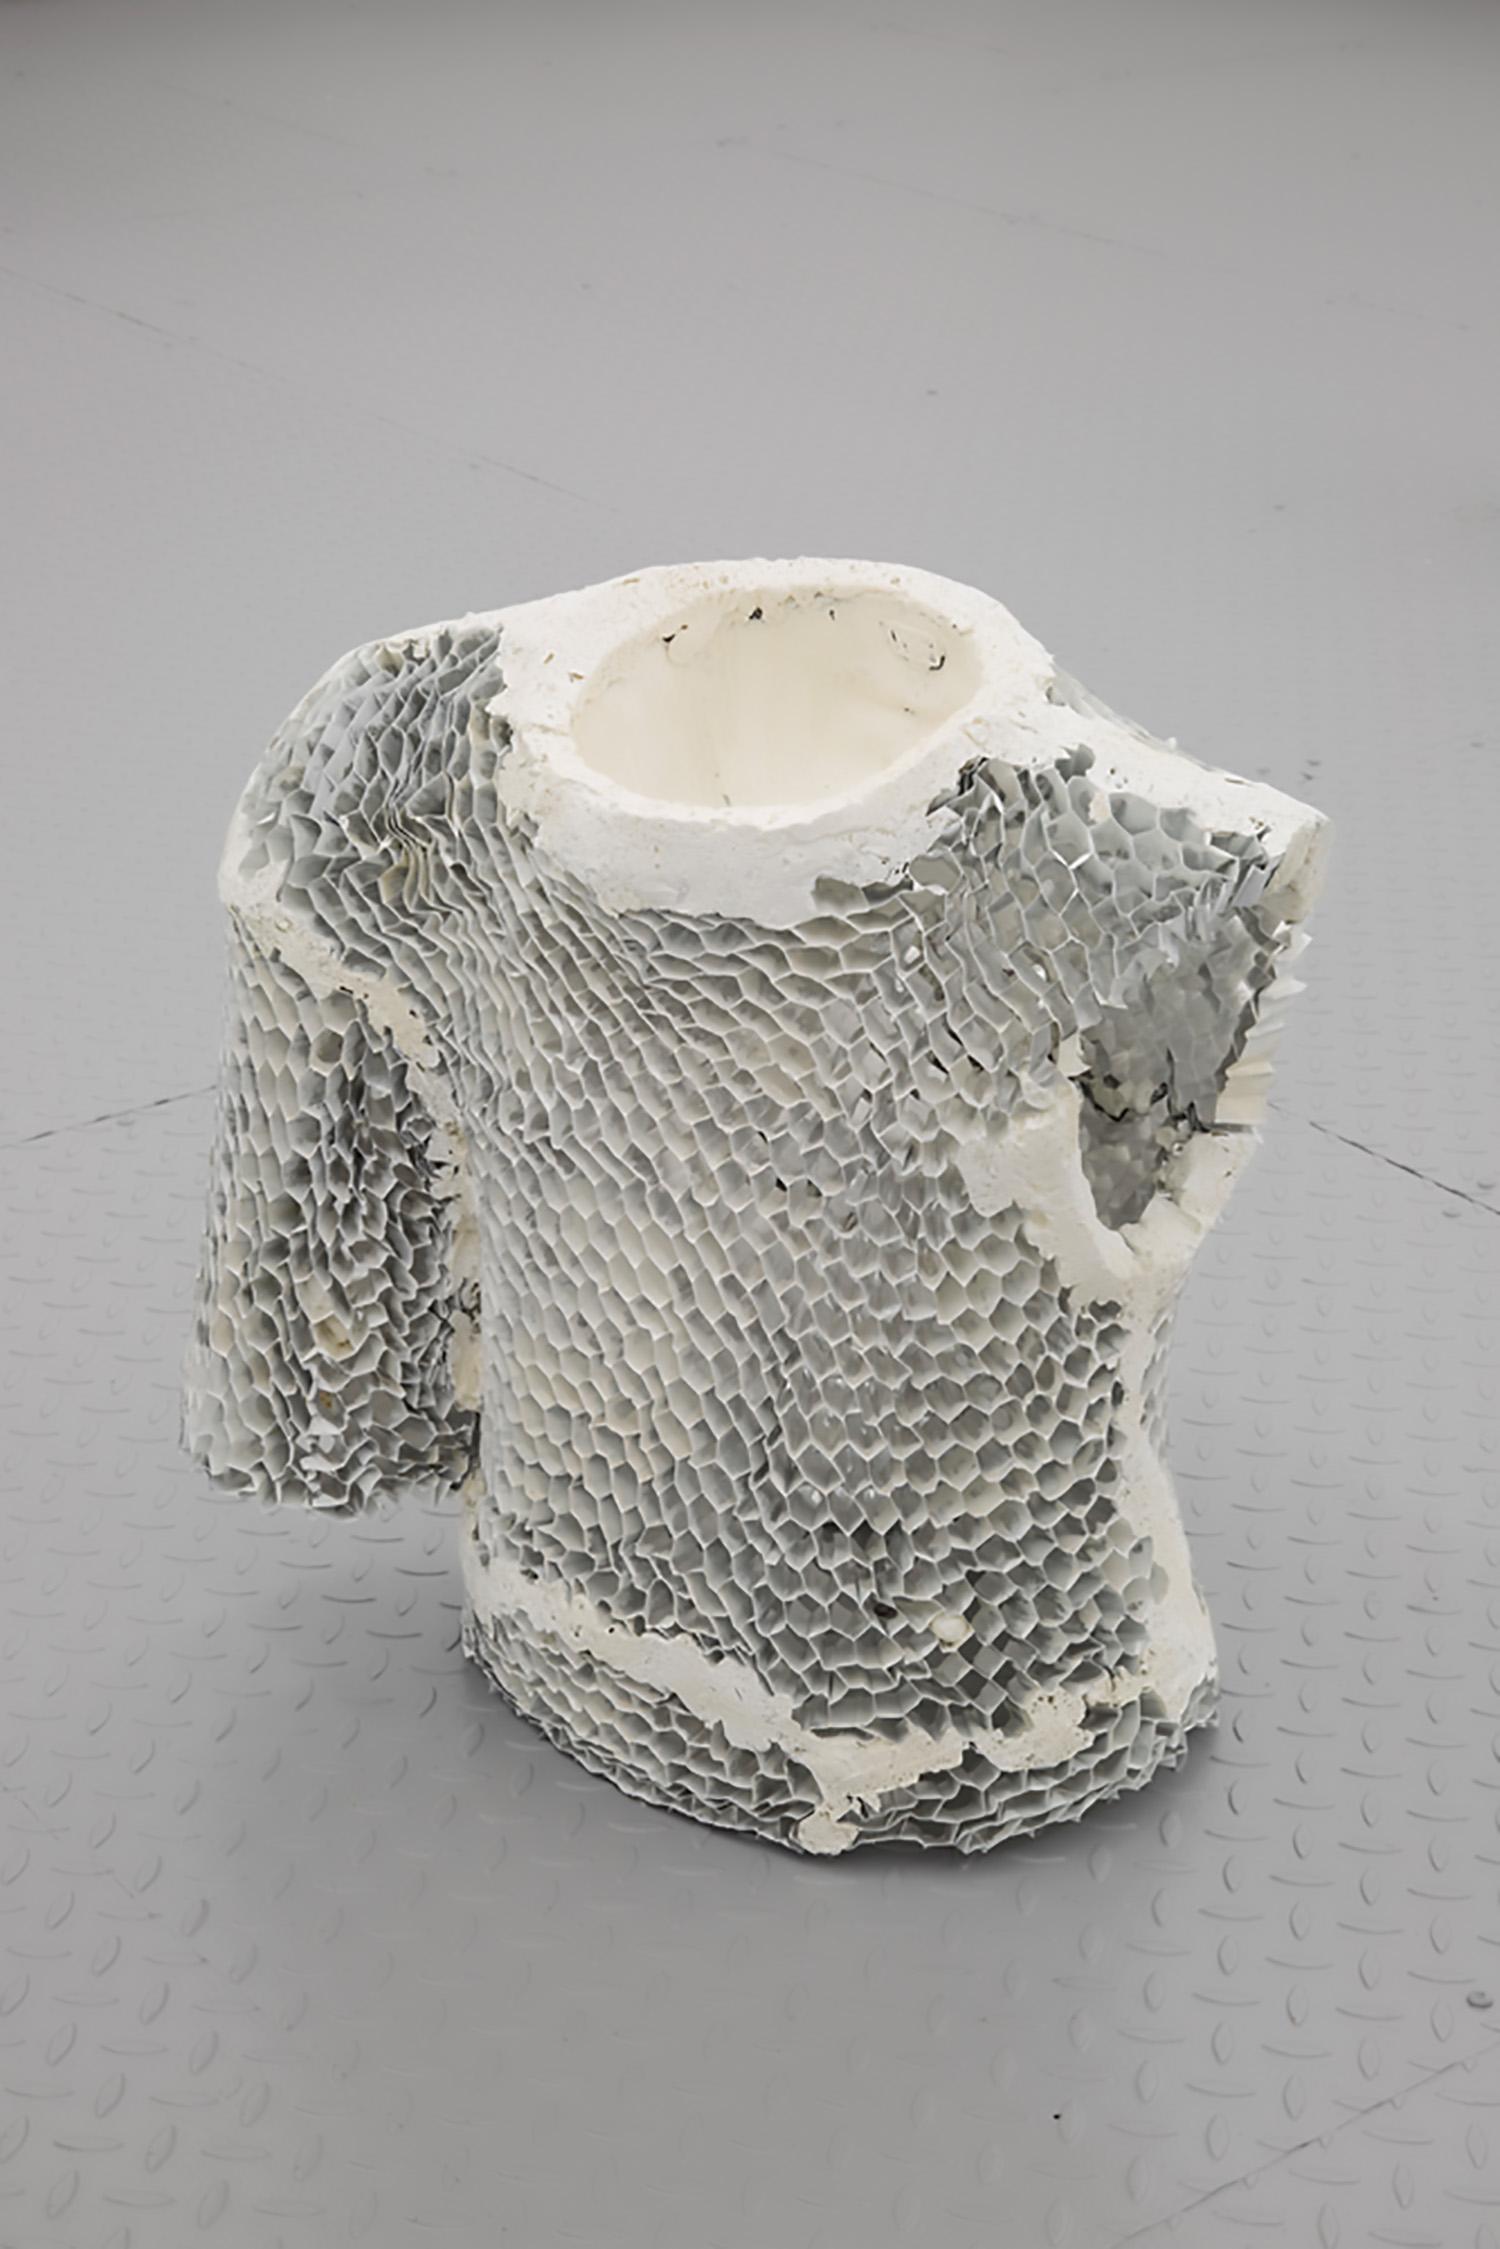 "Piotr Łakomy,   Untitled , 2016, Aluminium honeycomb, fabric (cap), insulation foam, paint, 22"" x 24"" x 12"", Courtesy of galeria stereo"